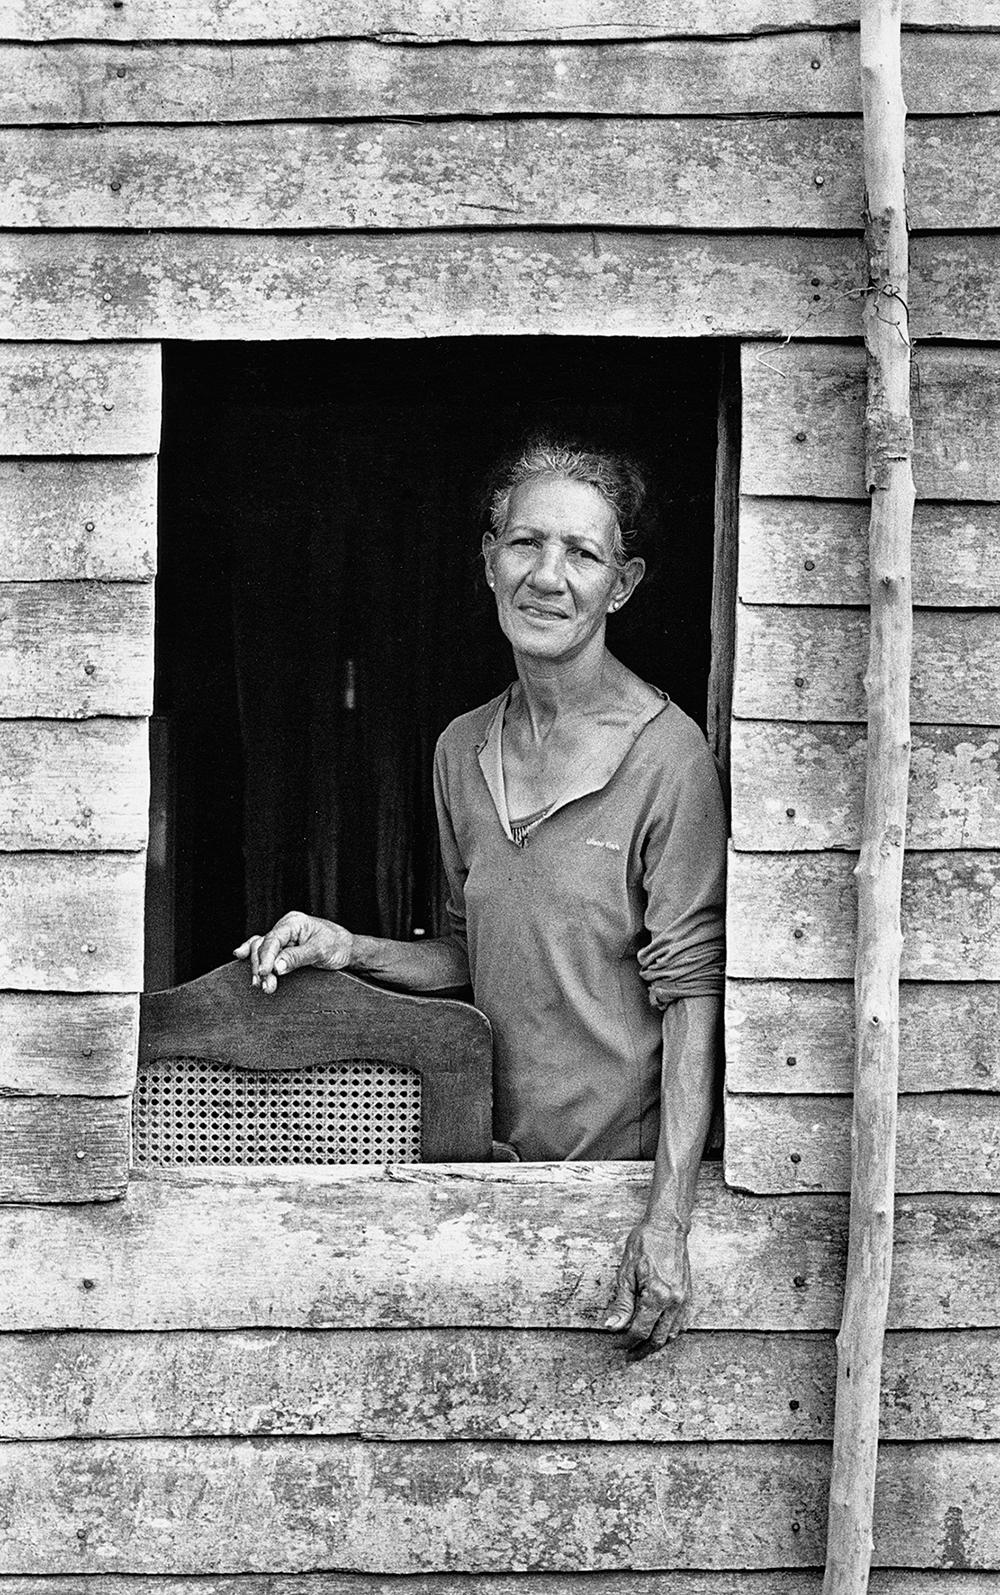 Finca Ildelisa, Pio Cuá, Matanzas, 2016  Photo © 2017 Elliott Erwitt/Magnum Photos. All rights reserved.